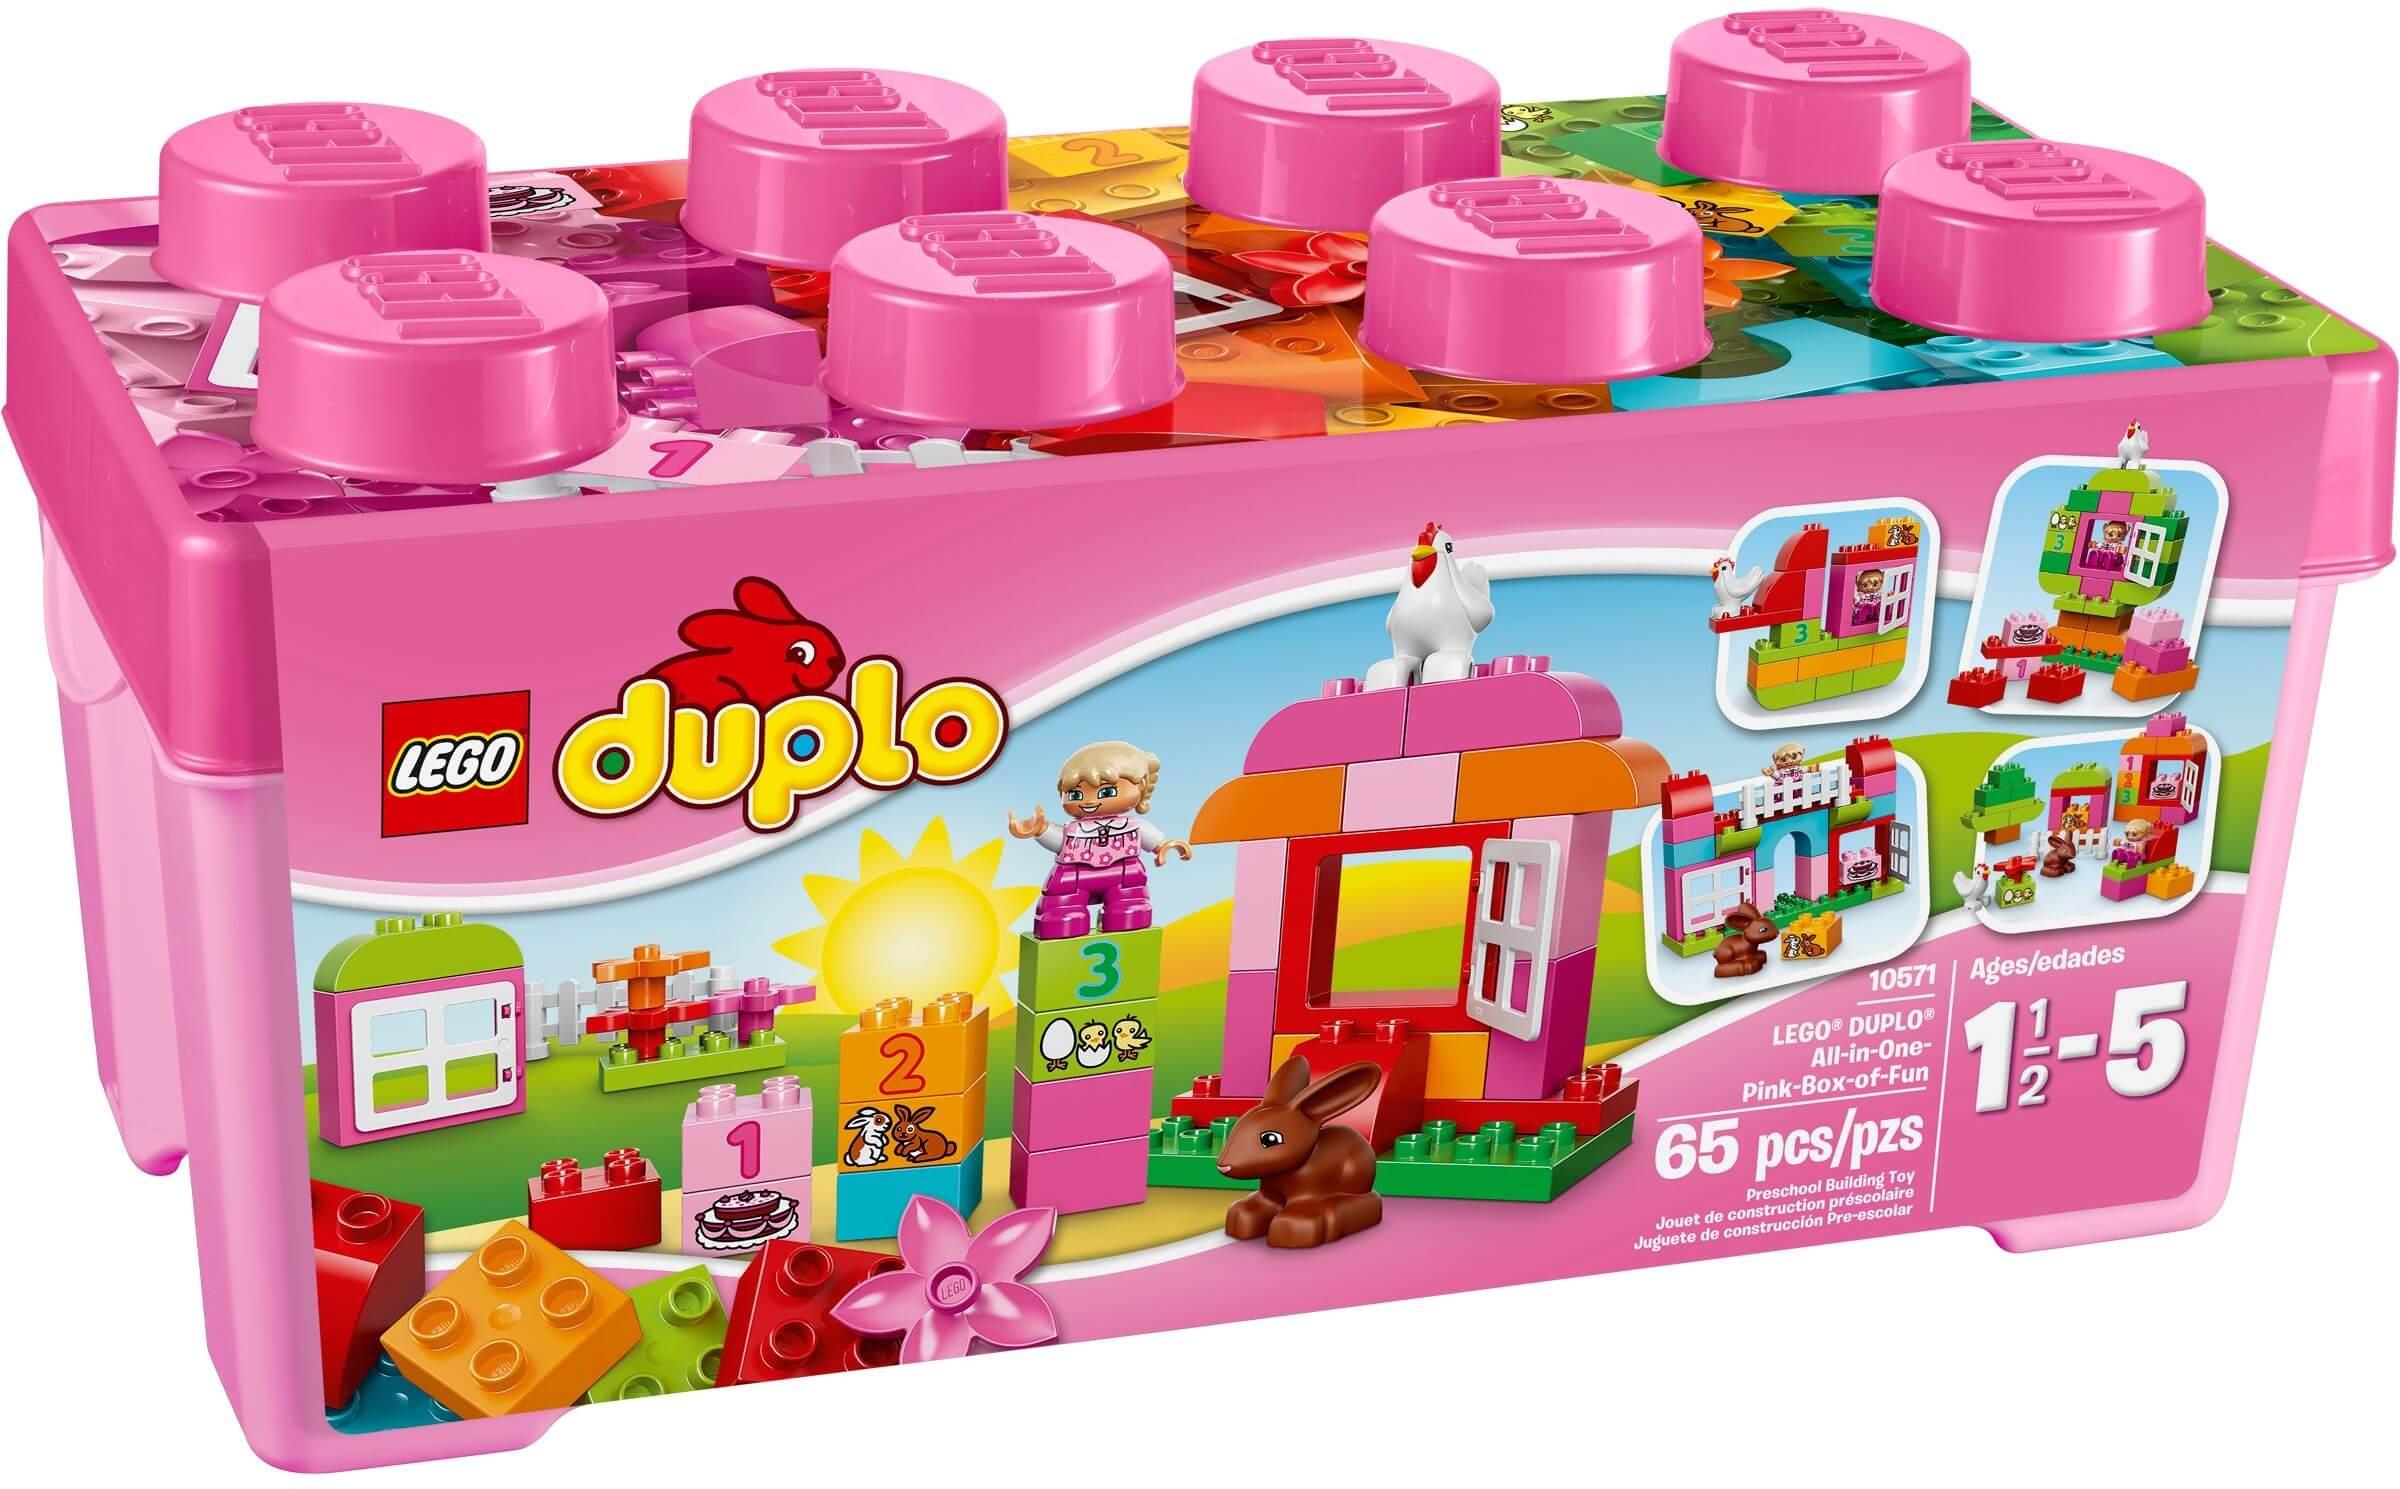 Mua đồ chơi LEGO 10571 - LEGO DUPLO 10571 - Thùng gạch LEGO DUPLO màu hồng 65 mảnh ghép (LEGO DUPLO All-in-One-Pink-Box-of-Fun 10571)